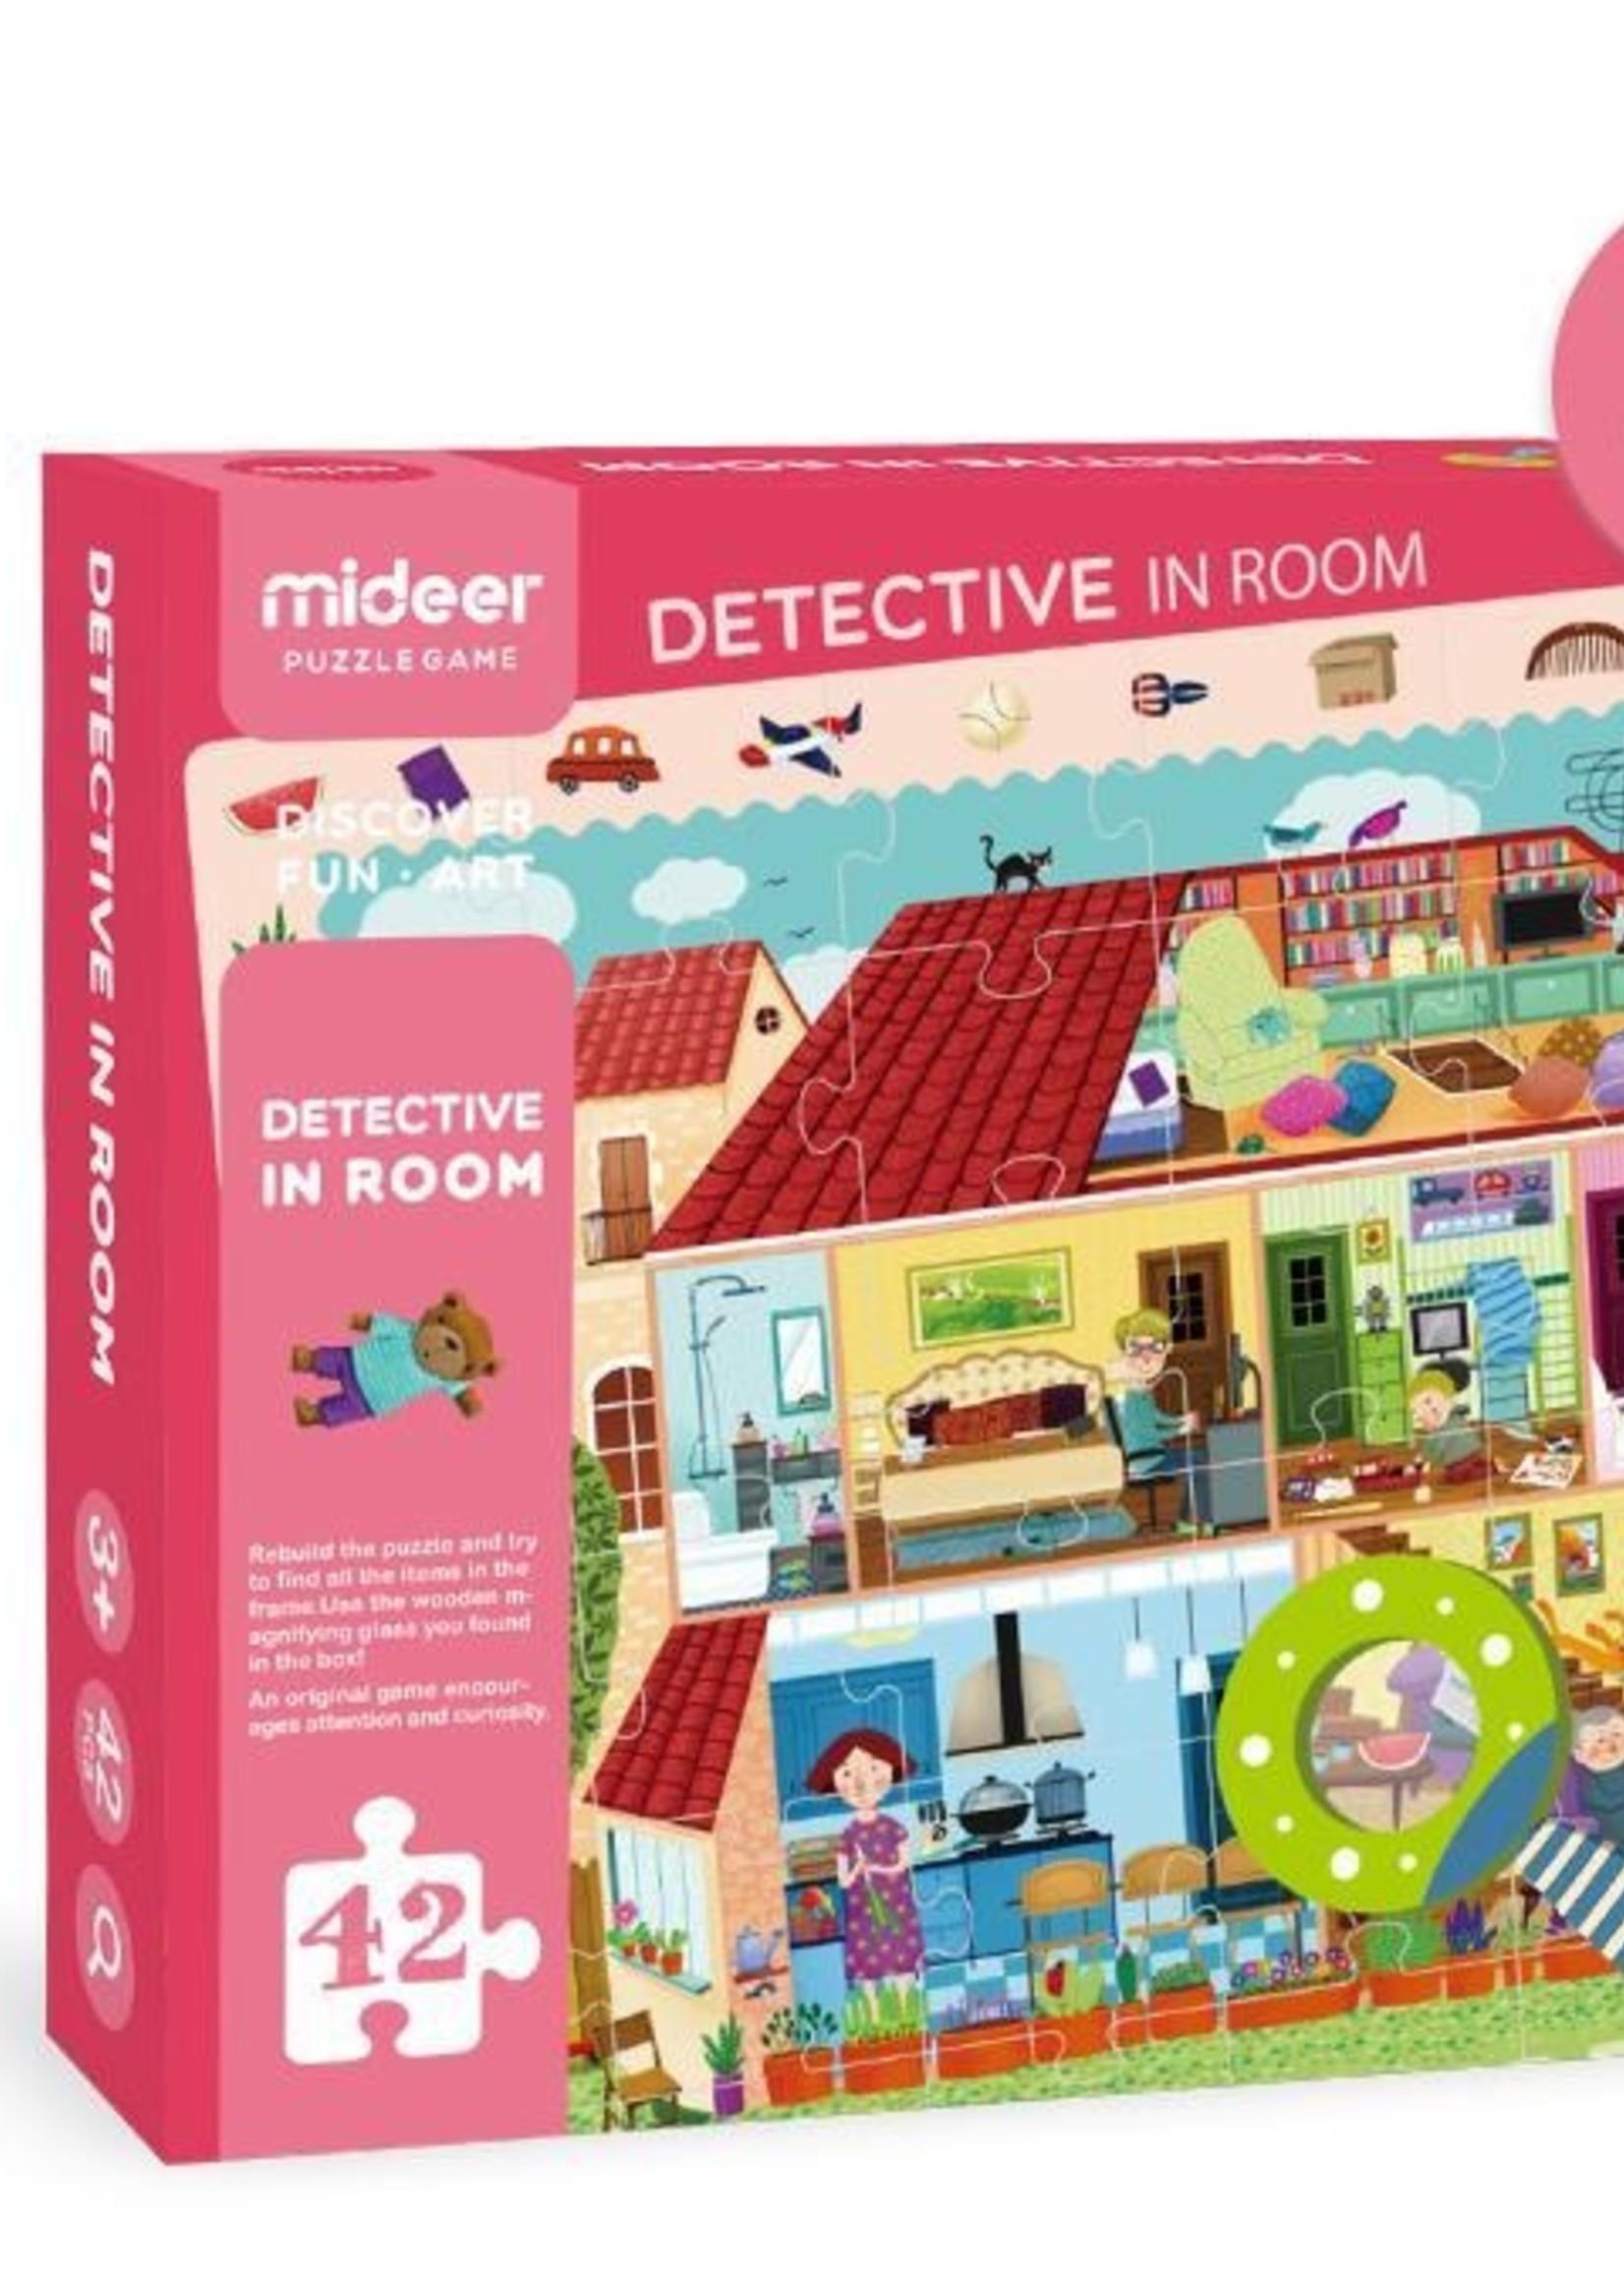 Mideer Mideer-AW20 MD3008 Detective in Room Puzzle 42 pcs31.26